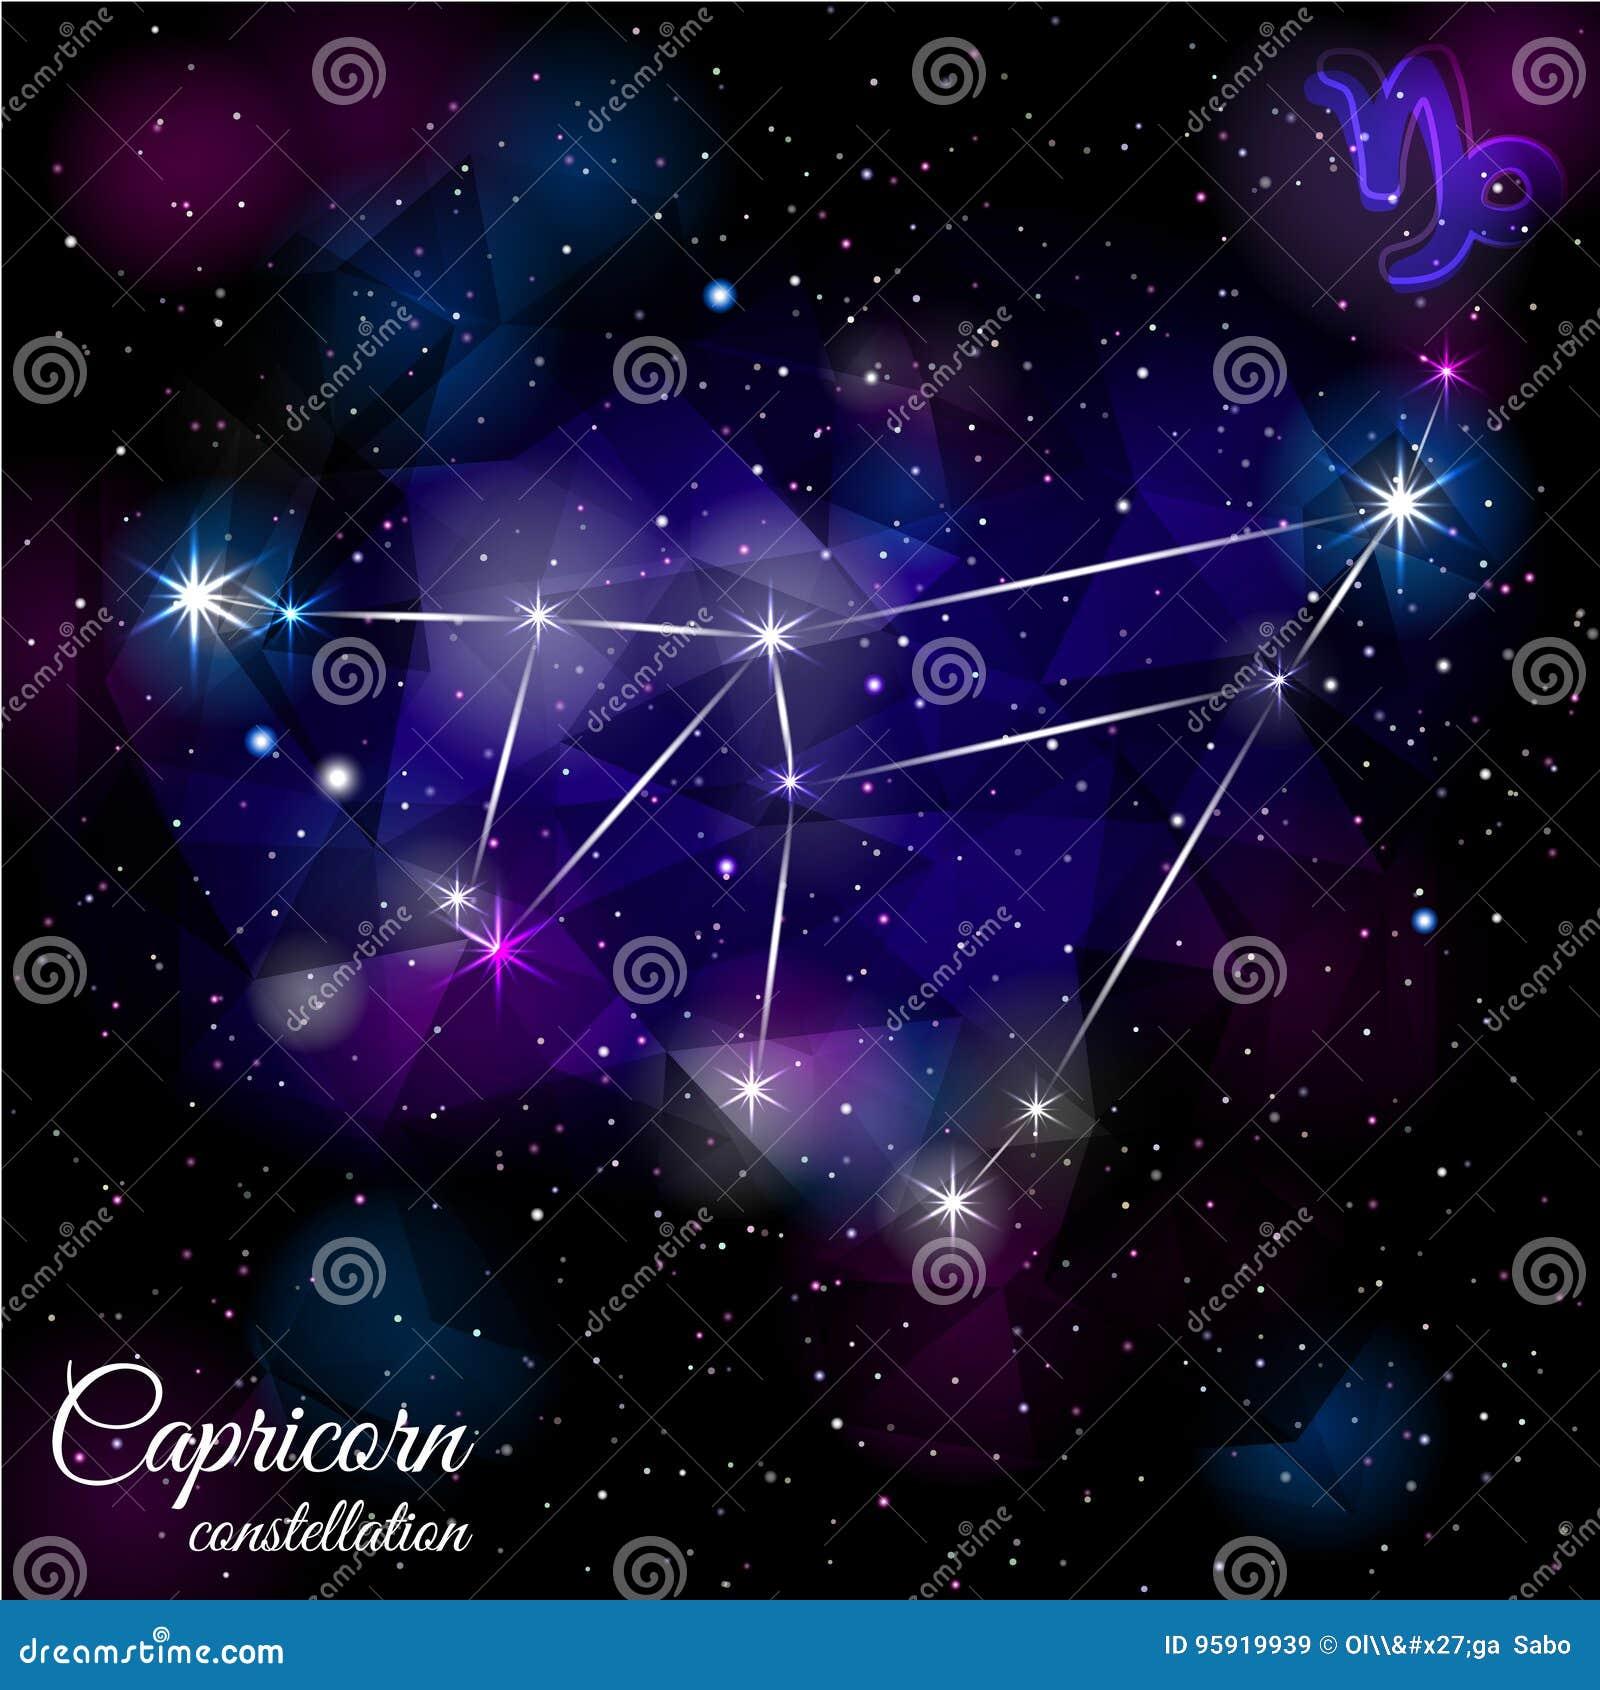 Capricorn - mystery constellation 45